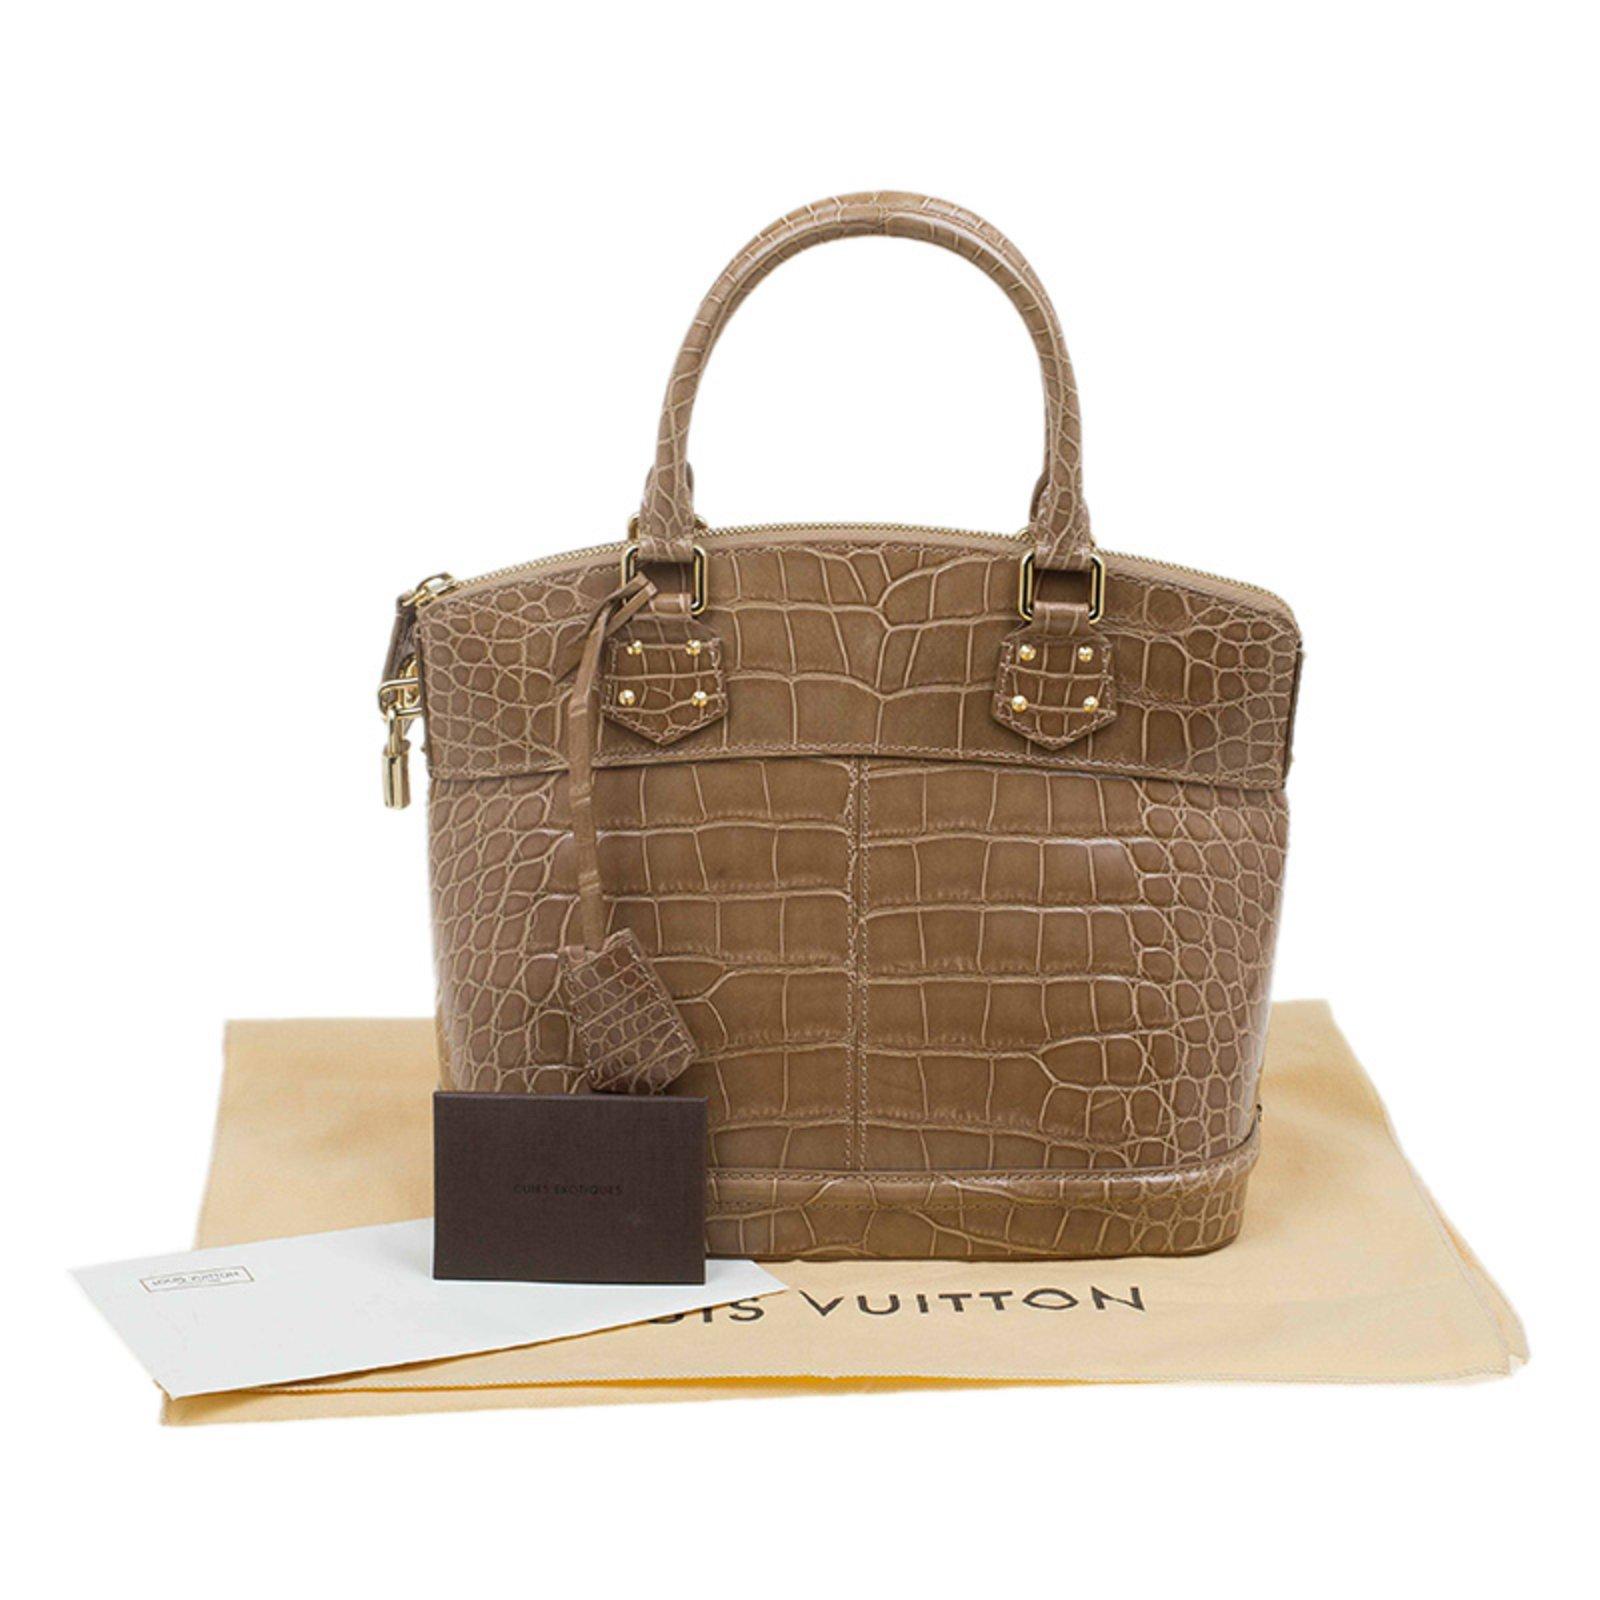 Louis Vuitton Lockit Pm Crocodile Handbags Exotic Leather Beige Ref 40718